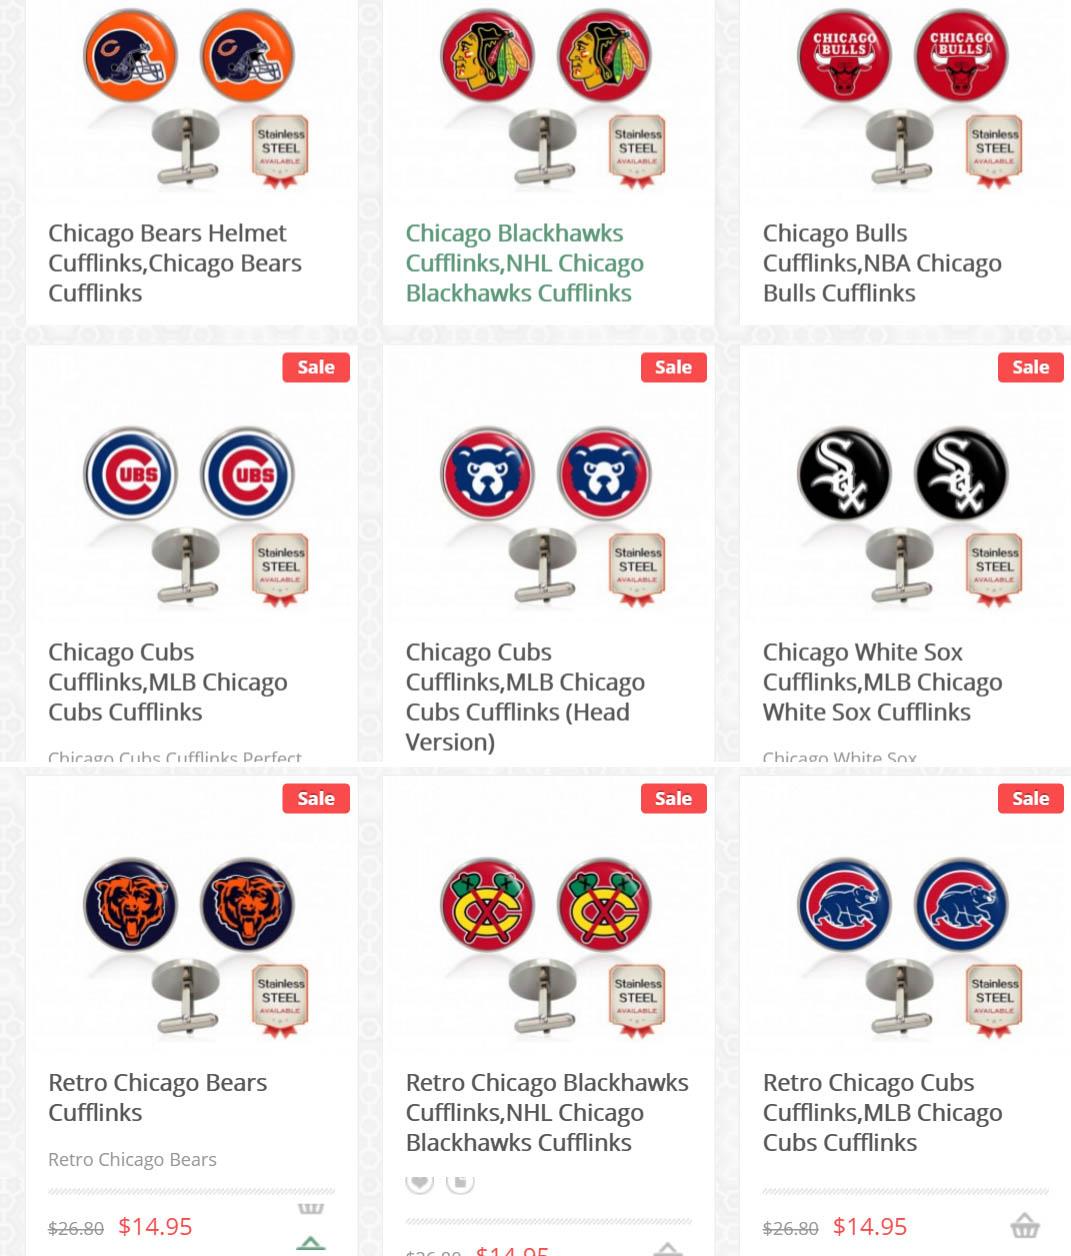 Handmade Cufflinks For Chicago Teams